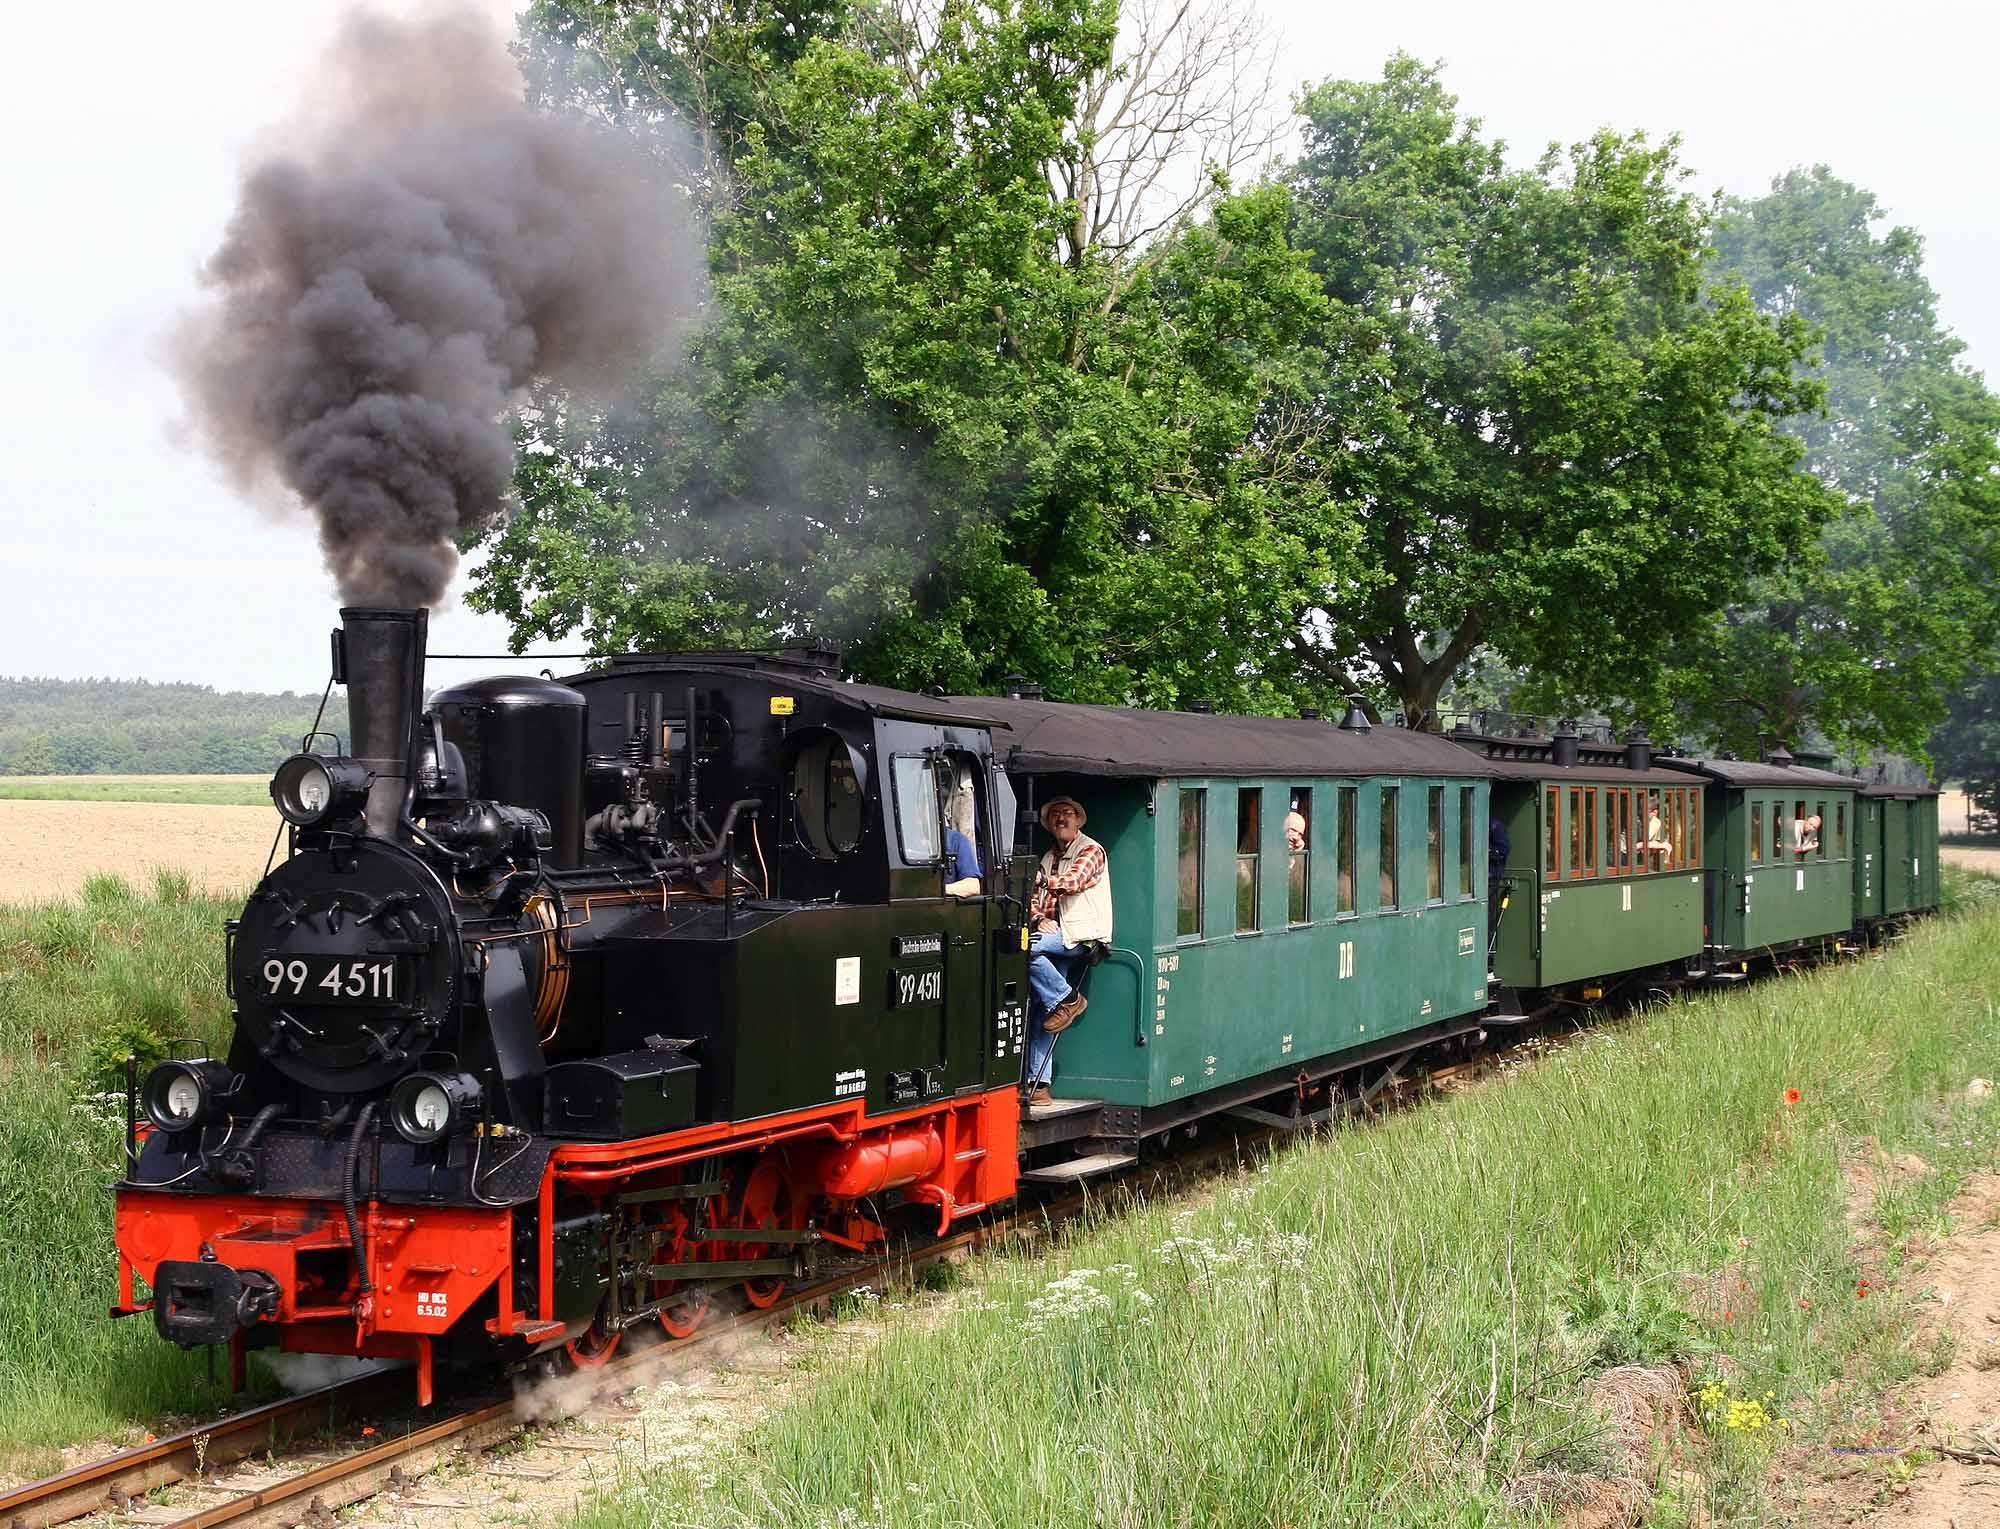 Prignitztvprignitz_museumseisenbahn_pollo_bildquellle_prignitzer_kleinbahnmuseum_lindenberg_e.v.